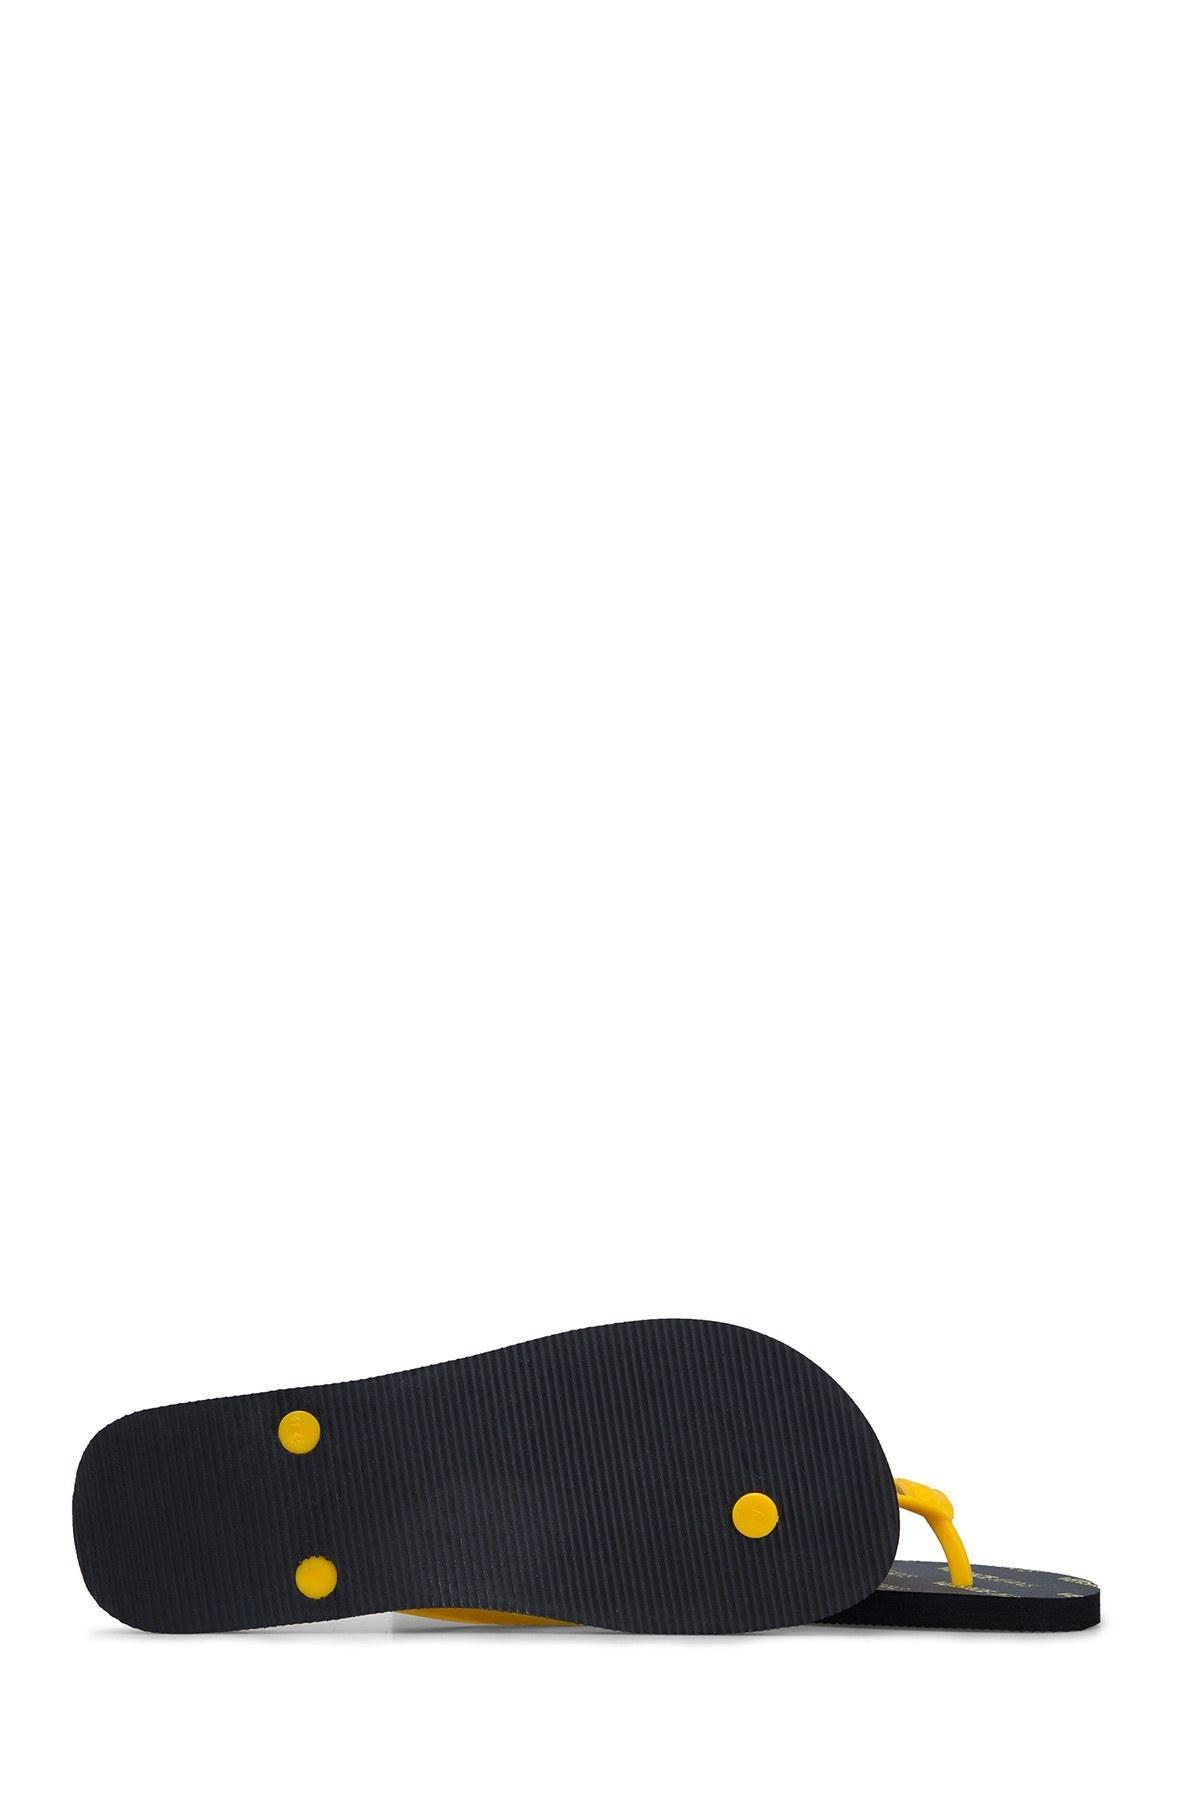 Versace Jeans Erkek Terlik E0YTBSQ1 70982 LN3 LACİVERT